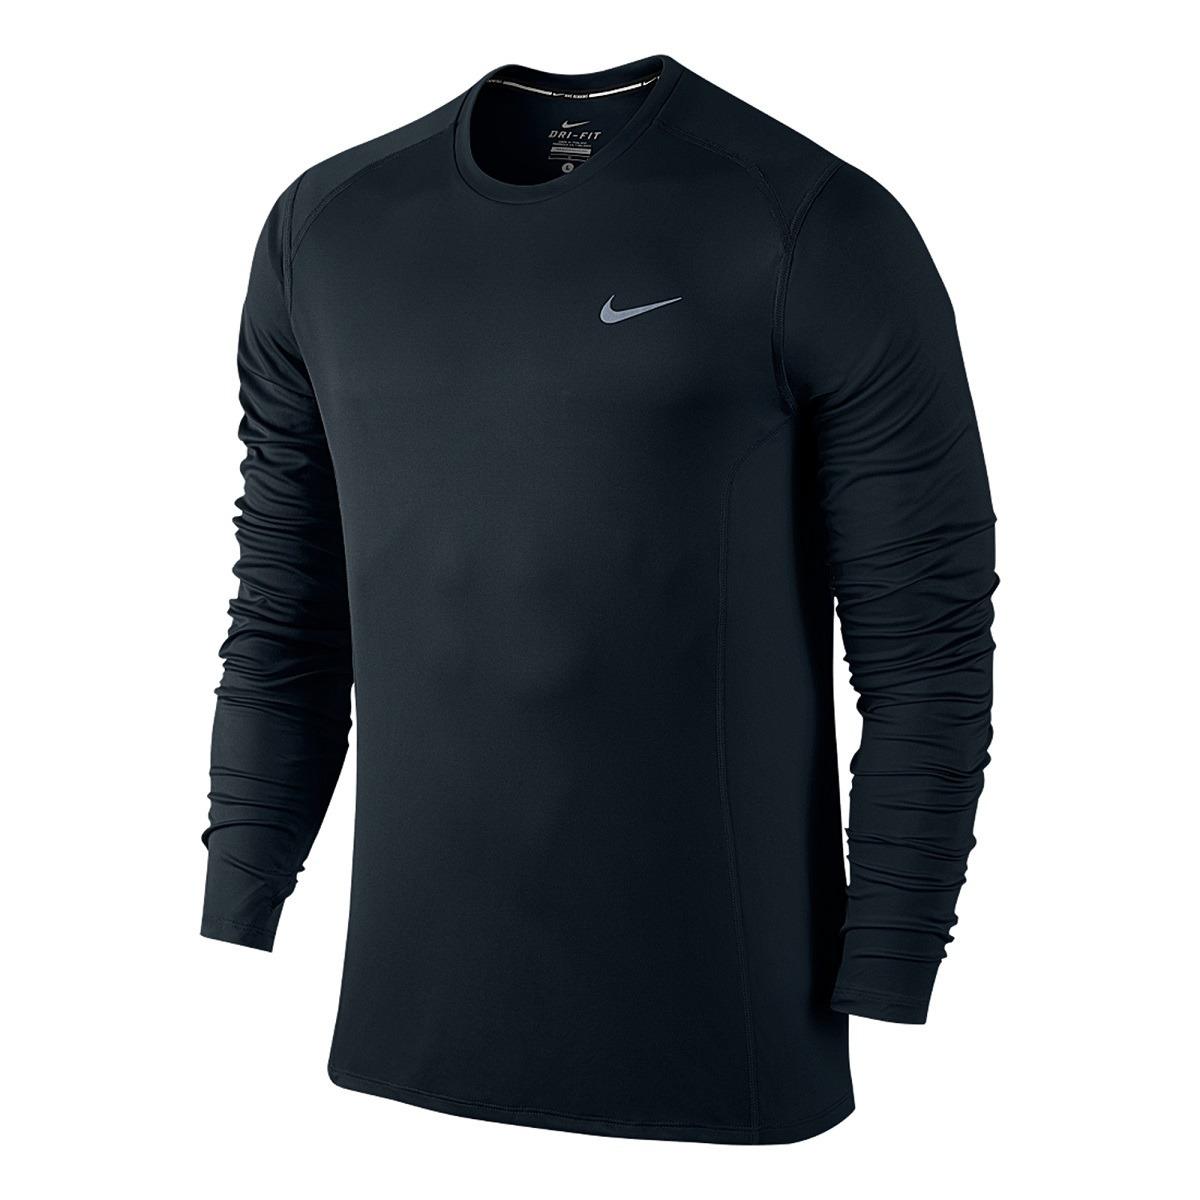 camiseta nike preta manga longa masculina original u.v. Carregando zoom. e4330f69c9931